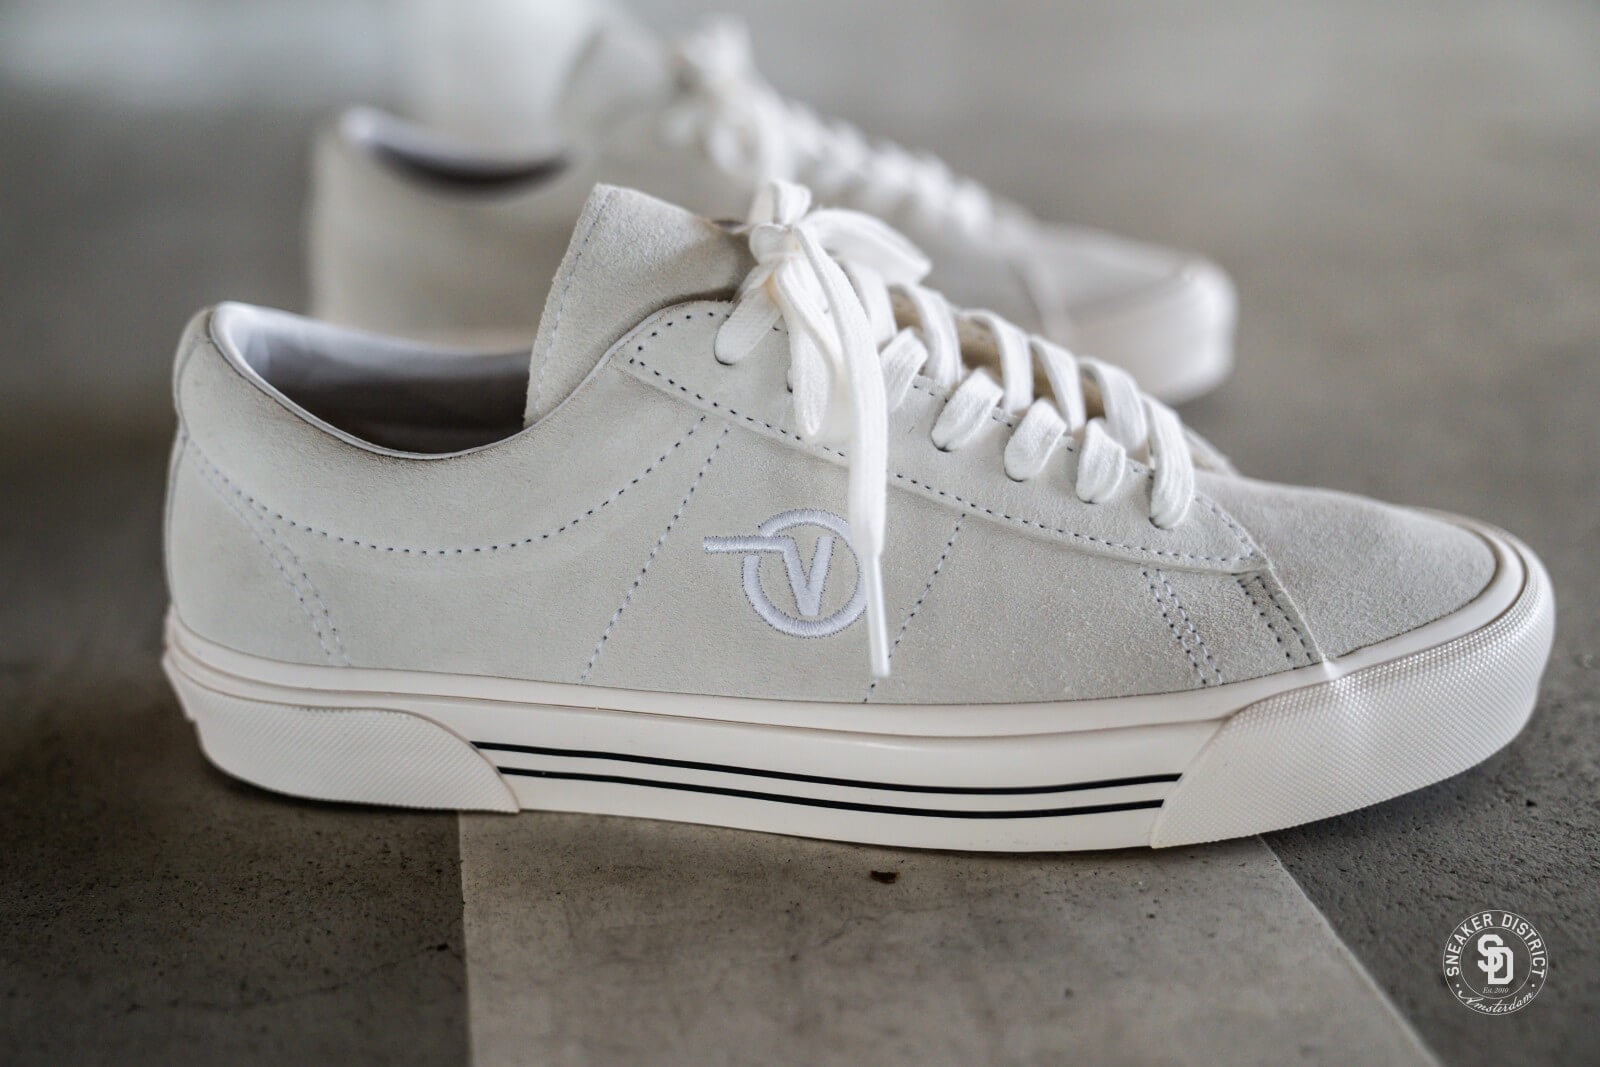 Vans Sid DX Anaheim Factory OG White